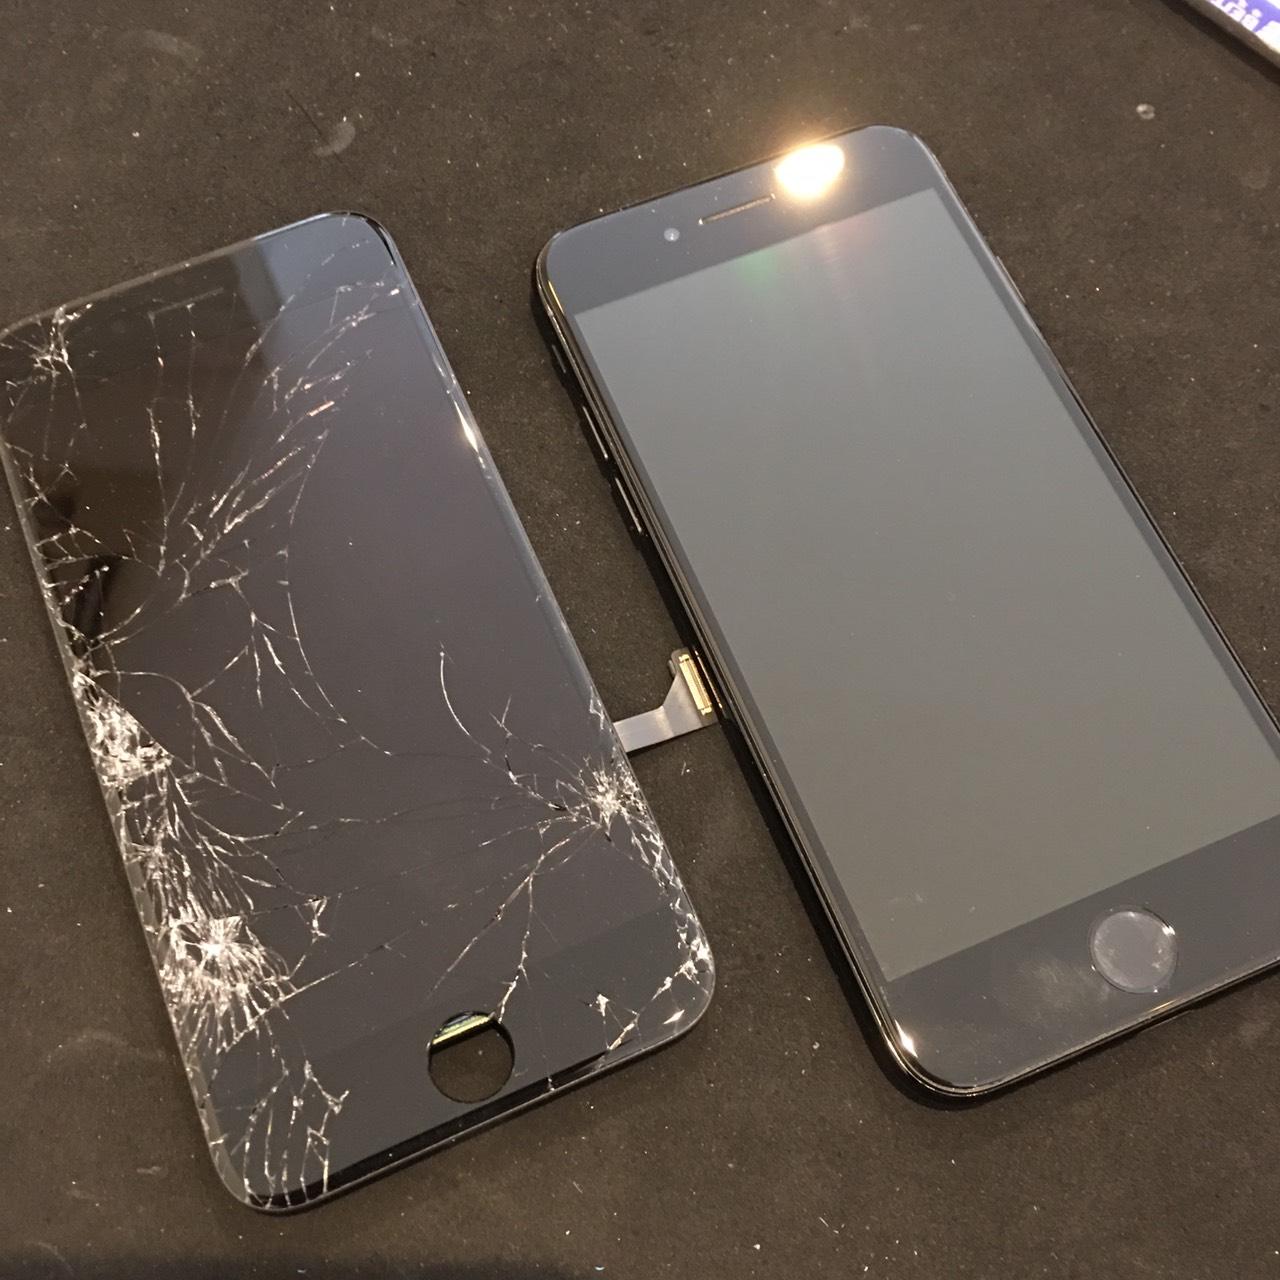 0527|iPhone7|液晶パネル交換修理